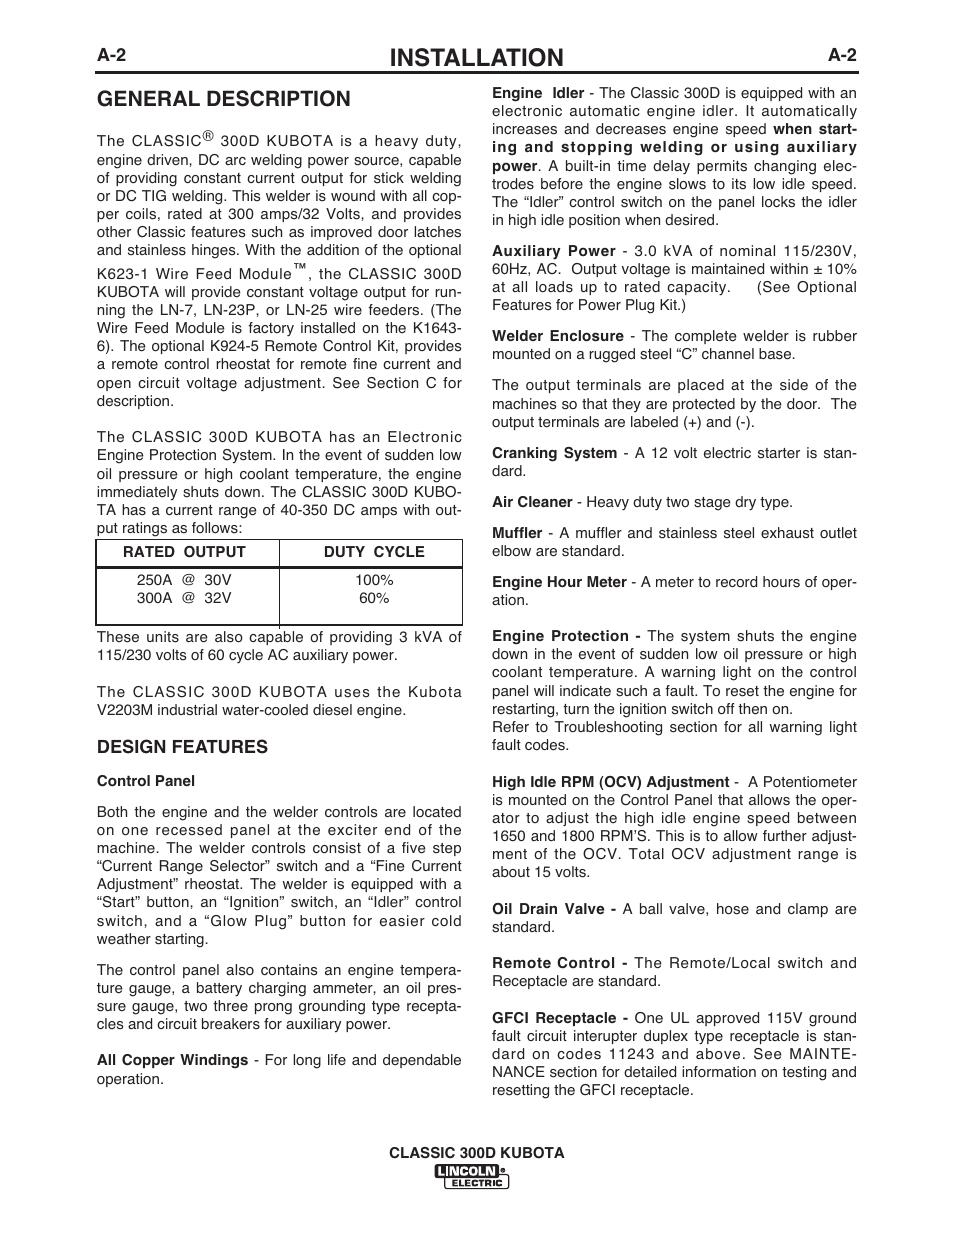 Installation, General description | Lincoln Electric CLASSIC 300D